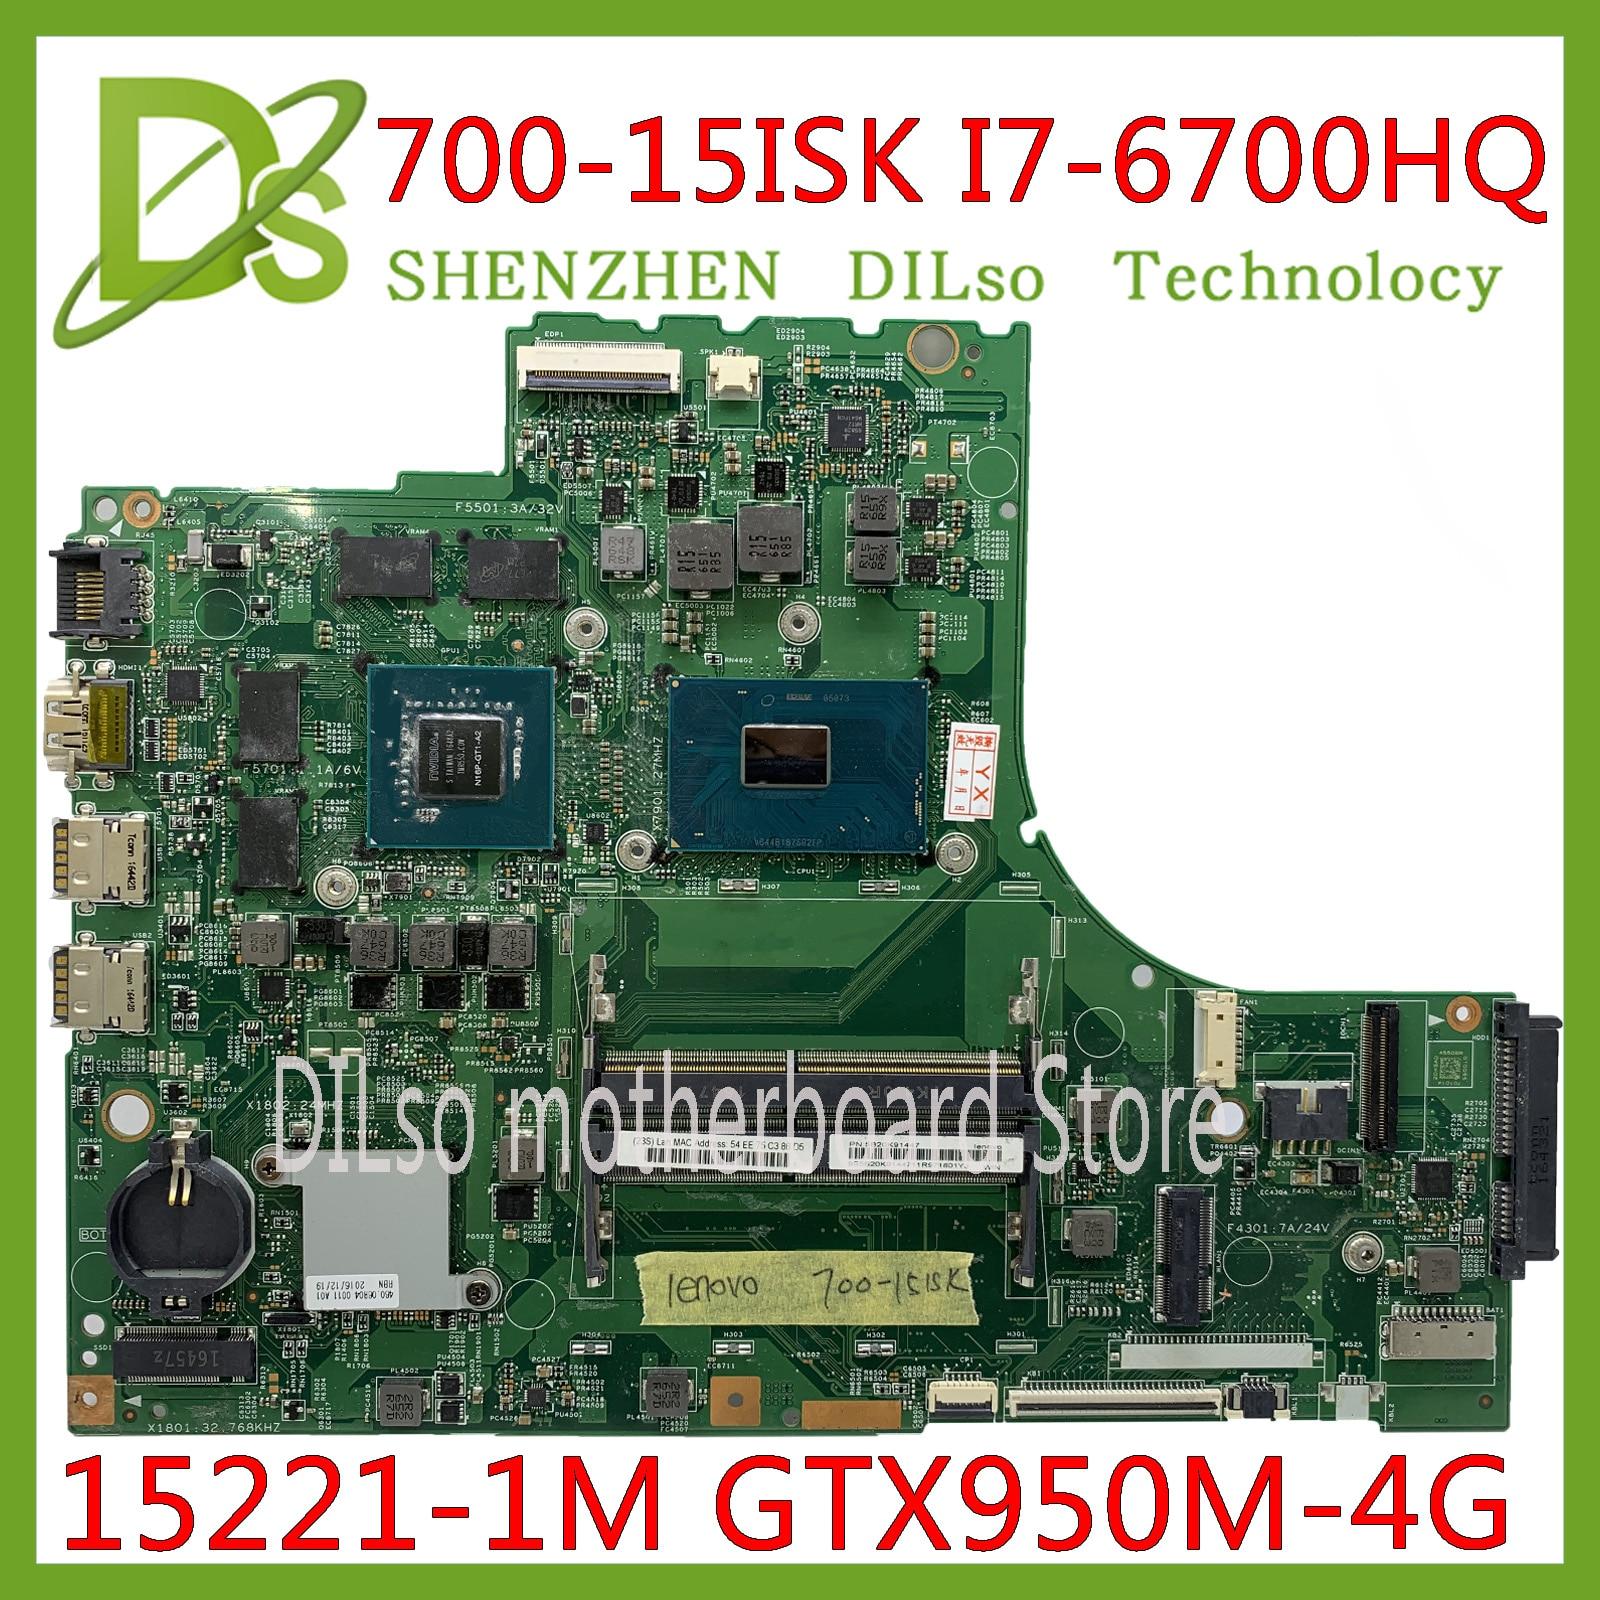 KEFU 700-15ISK Laptop Motherboard For Lenovo 700-15 700-15ISK Motherbaord DDR4 I7-6700HQ GTX950-4GB 15221-1M 448.06R01.001M